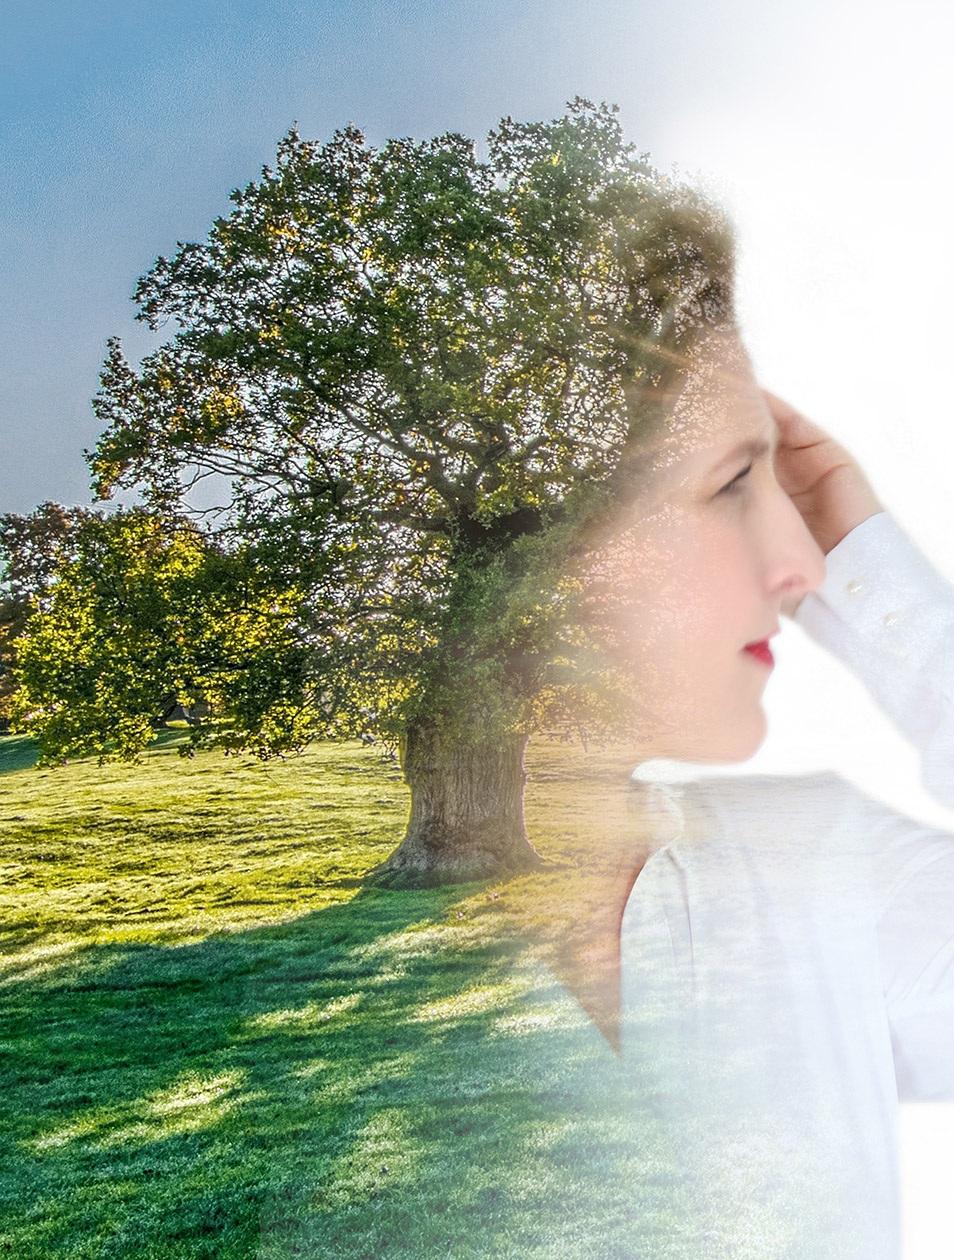 Nachhaltigkeit Klimaschutz Wald Relana Dombetzki ALDO Magazin